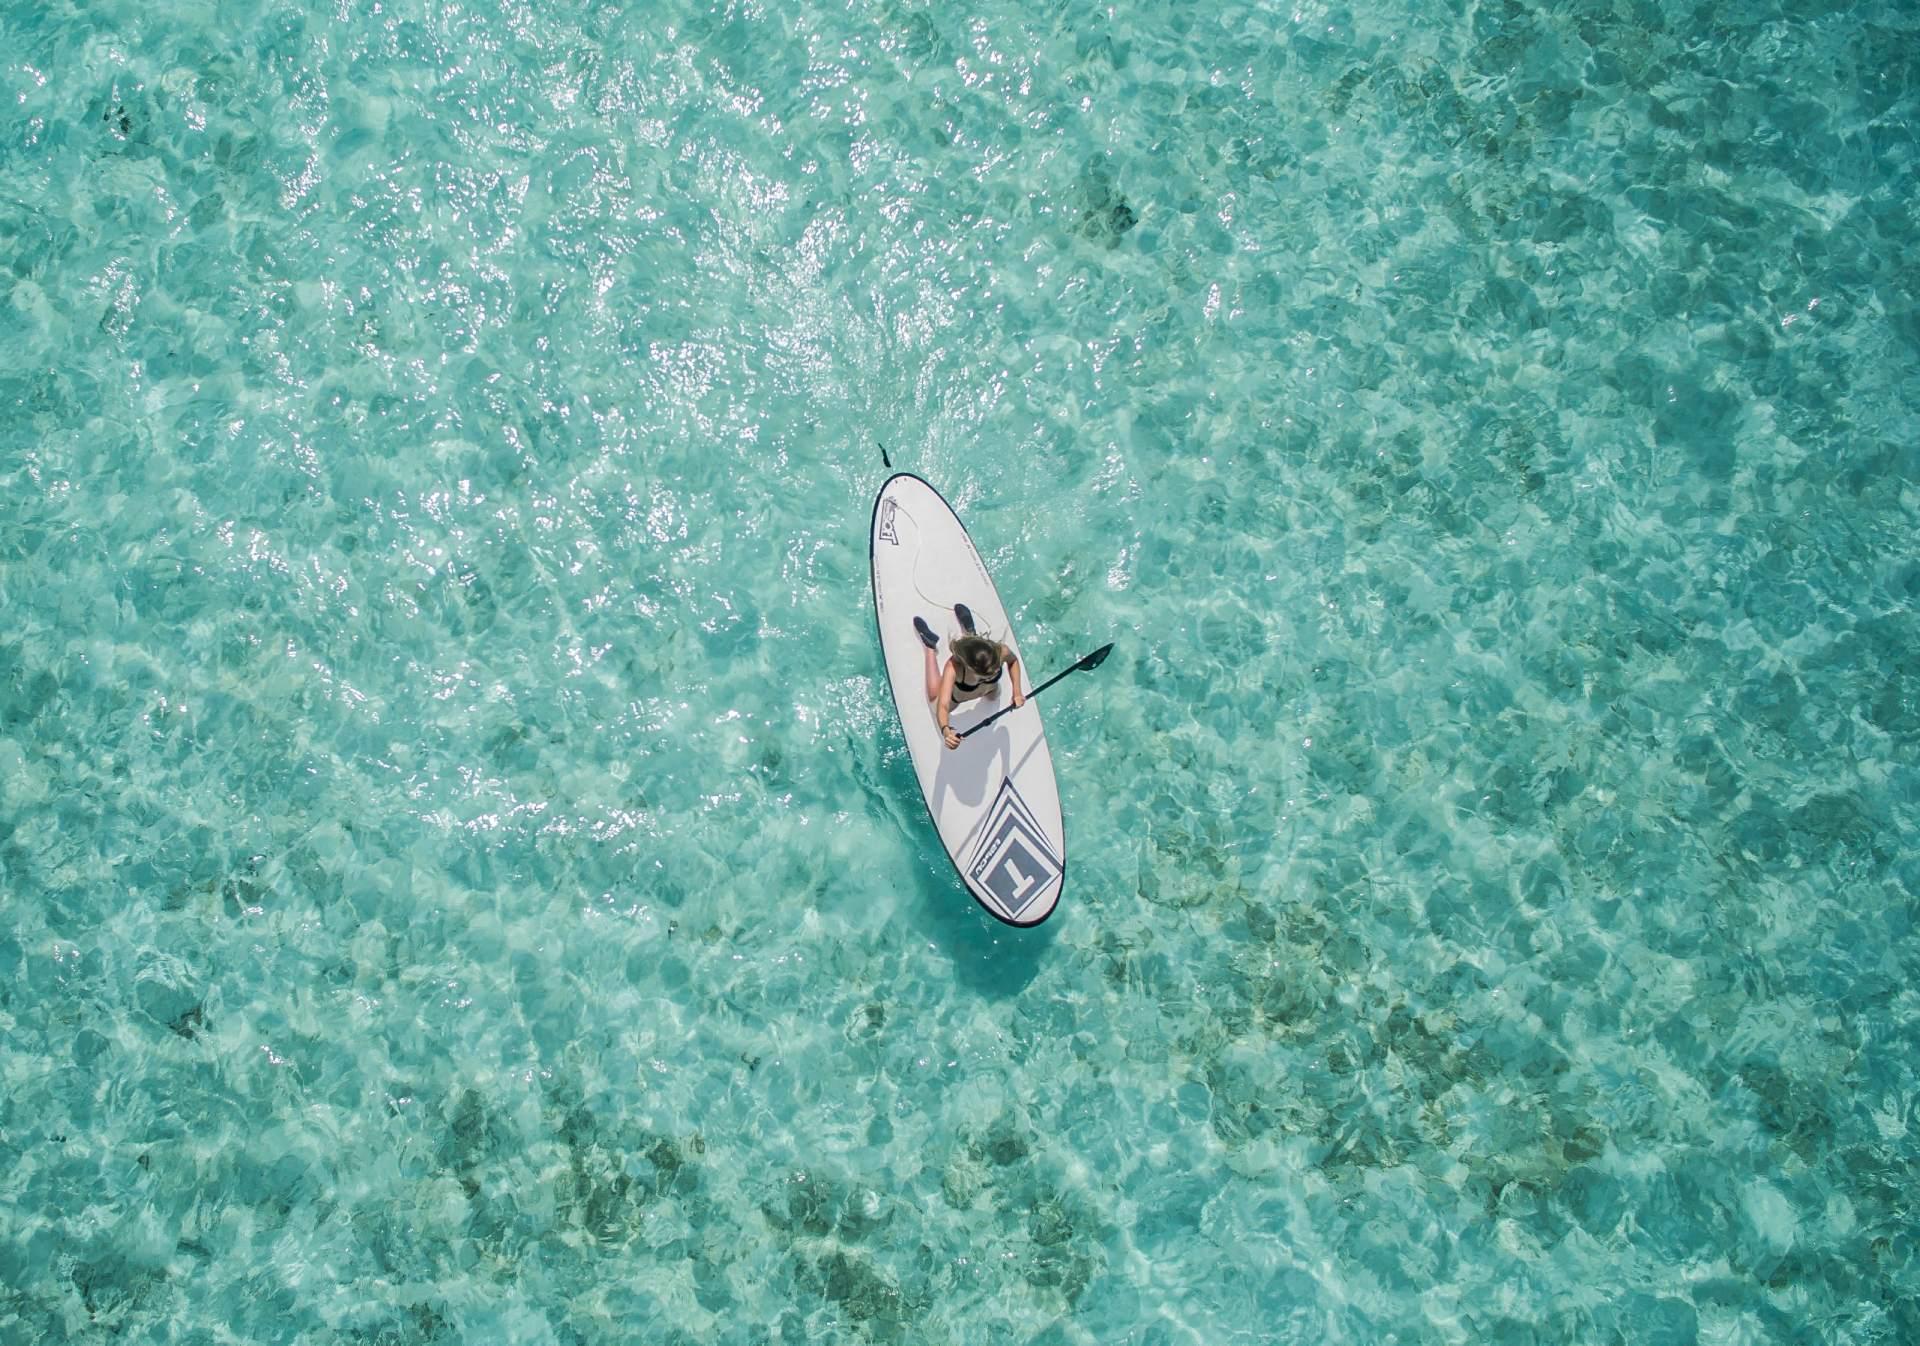 excursión stand up paddle y kayak mallorca